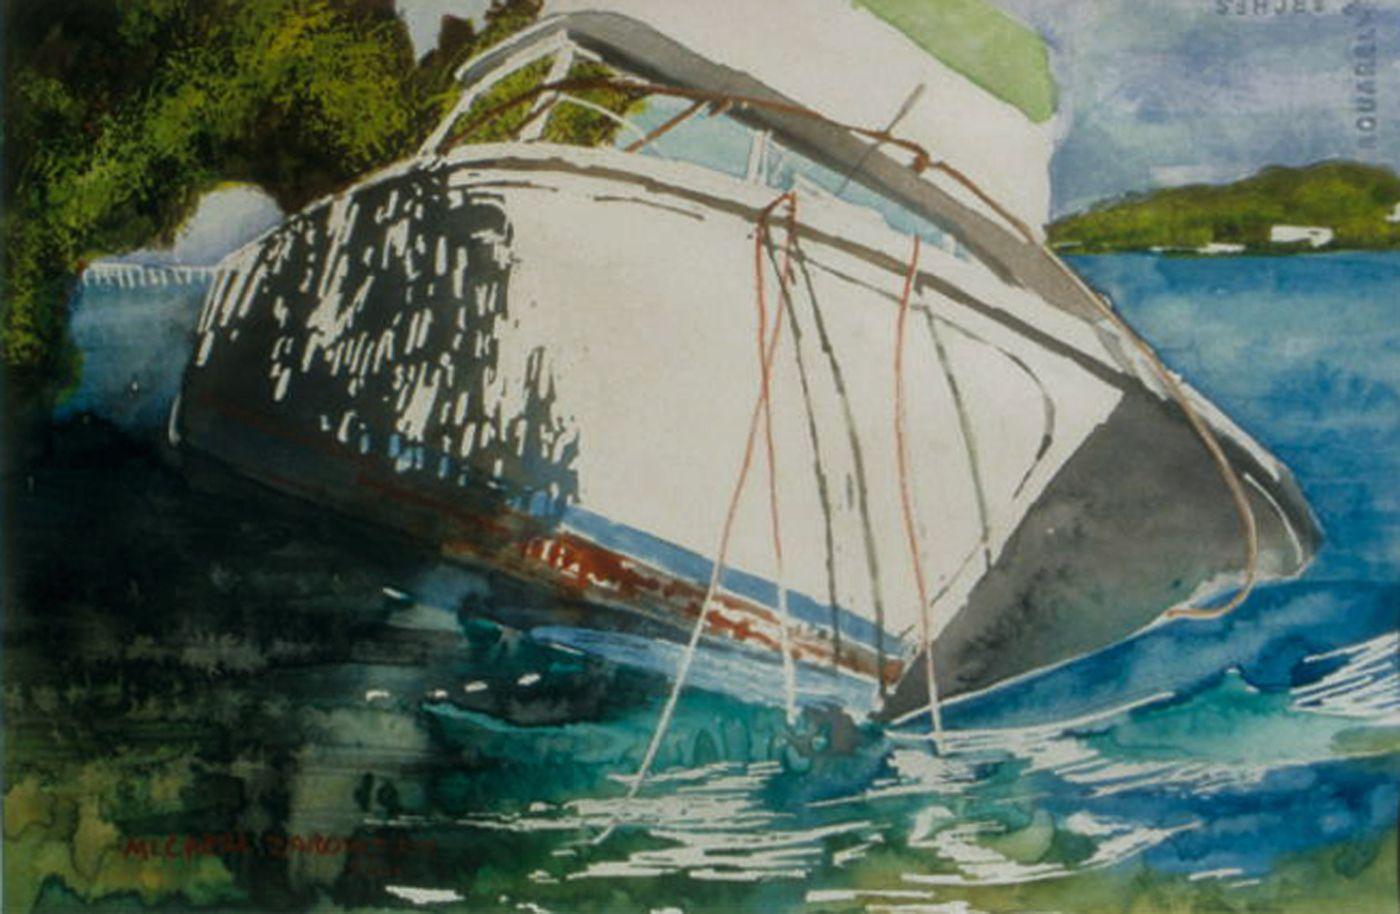 Micheal Zarowsky Half Sunk 2 Beef Island Bvi 10 X 16